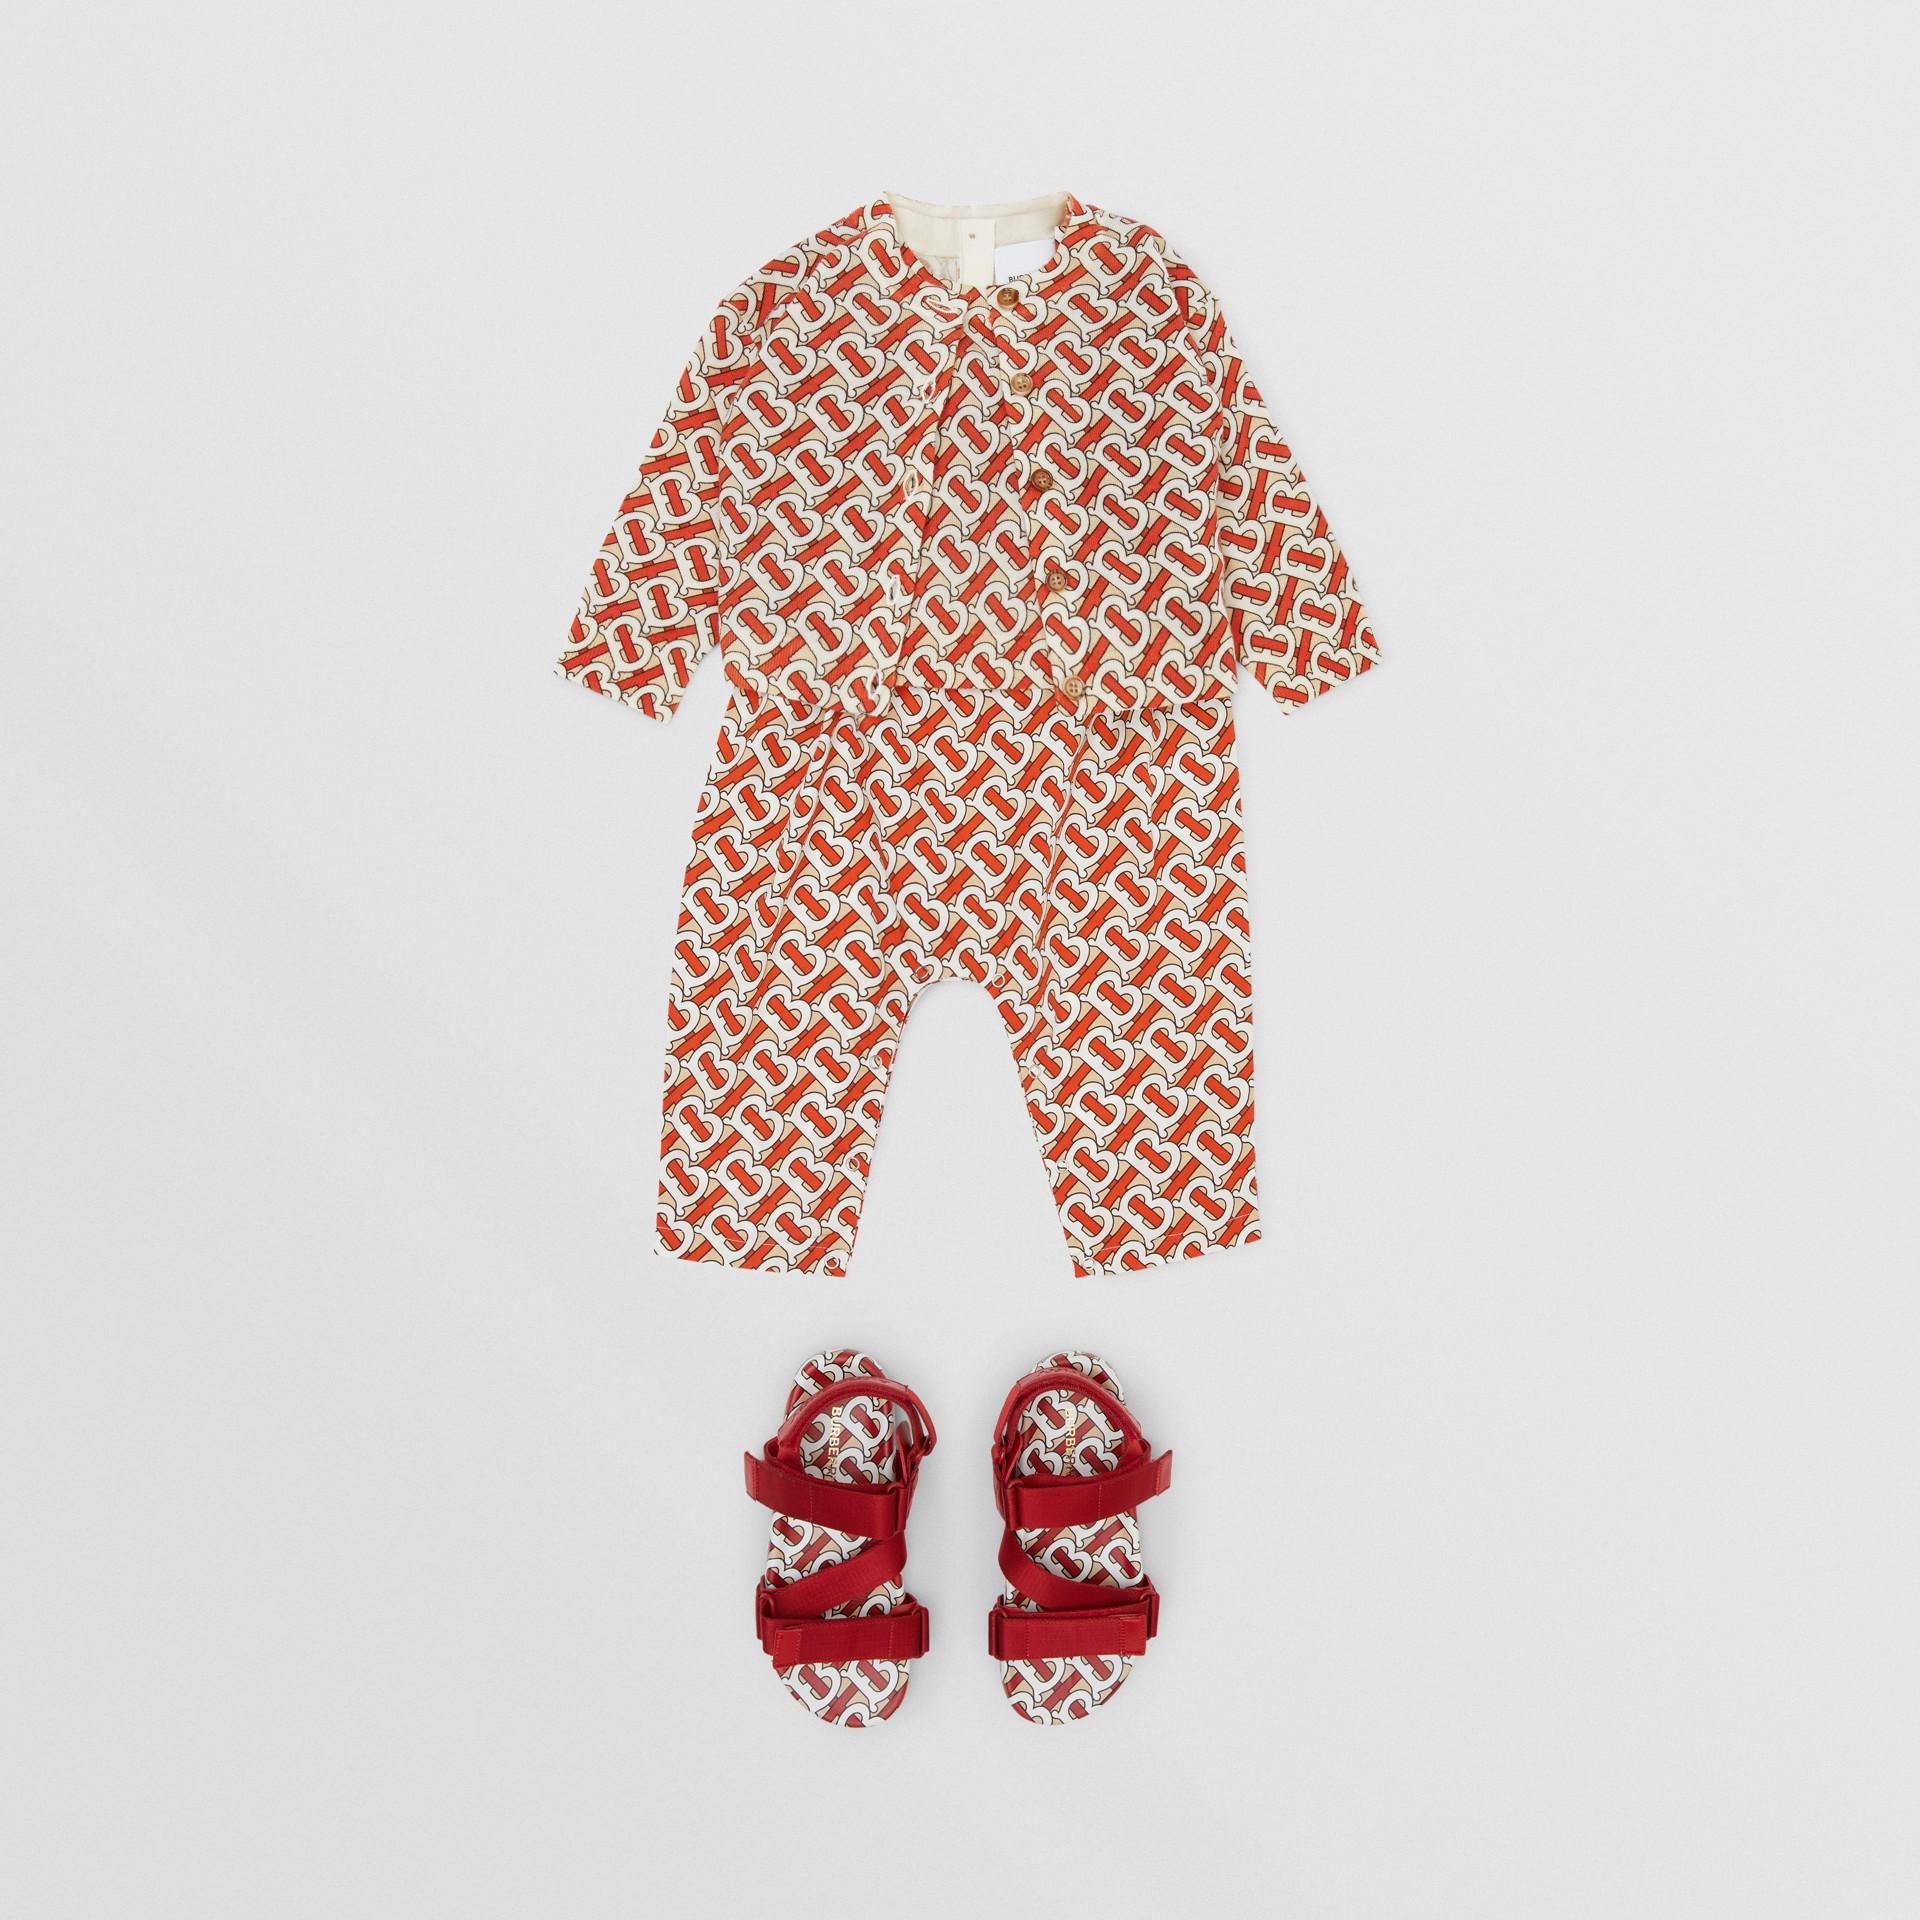 Monogram Print Merino Wool Two-piece Set in Vermilion - Children | Burberry - gallery image 3